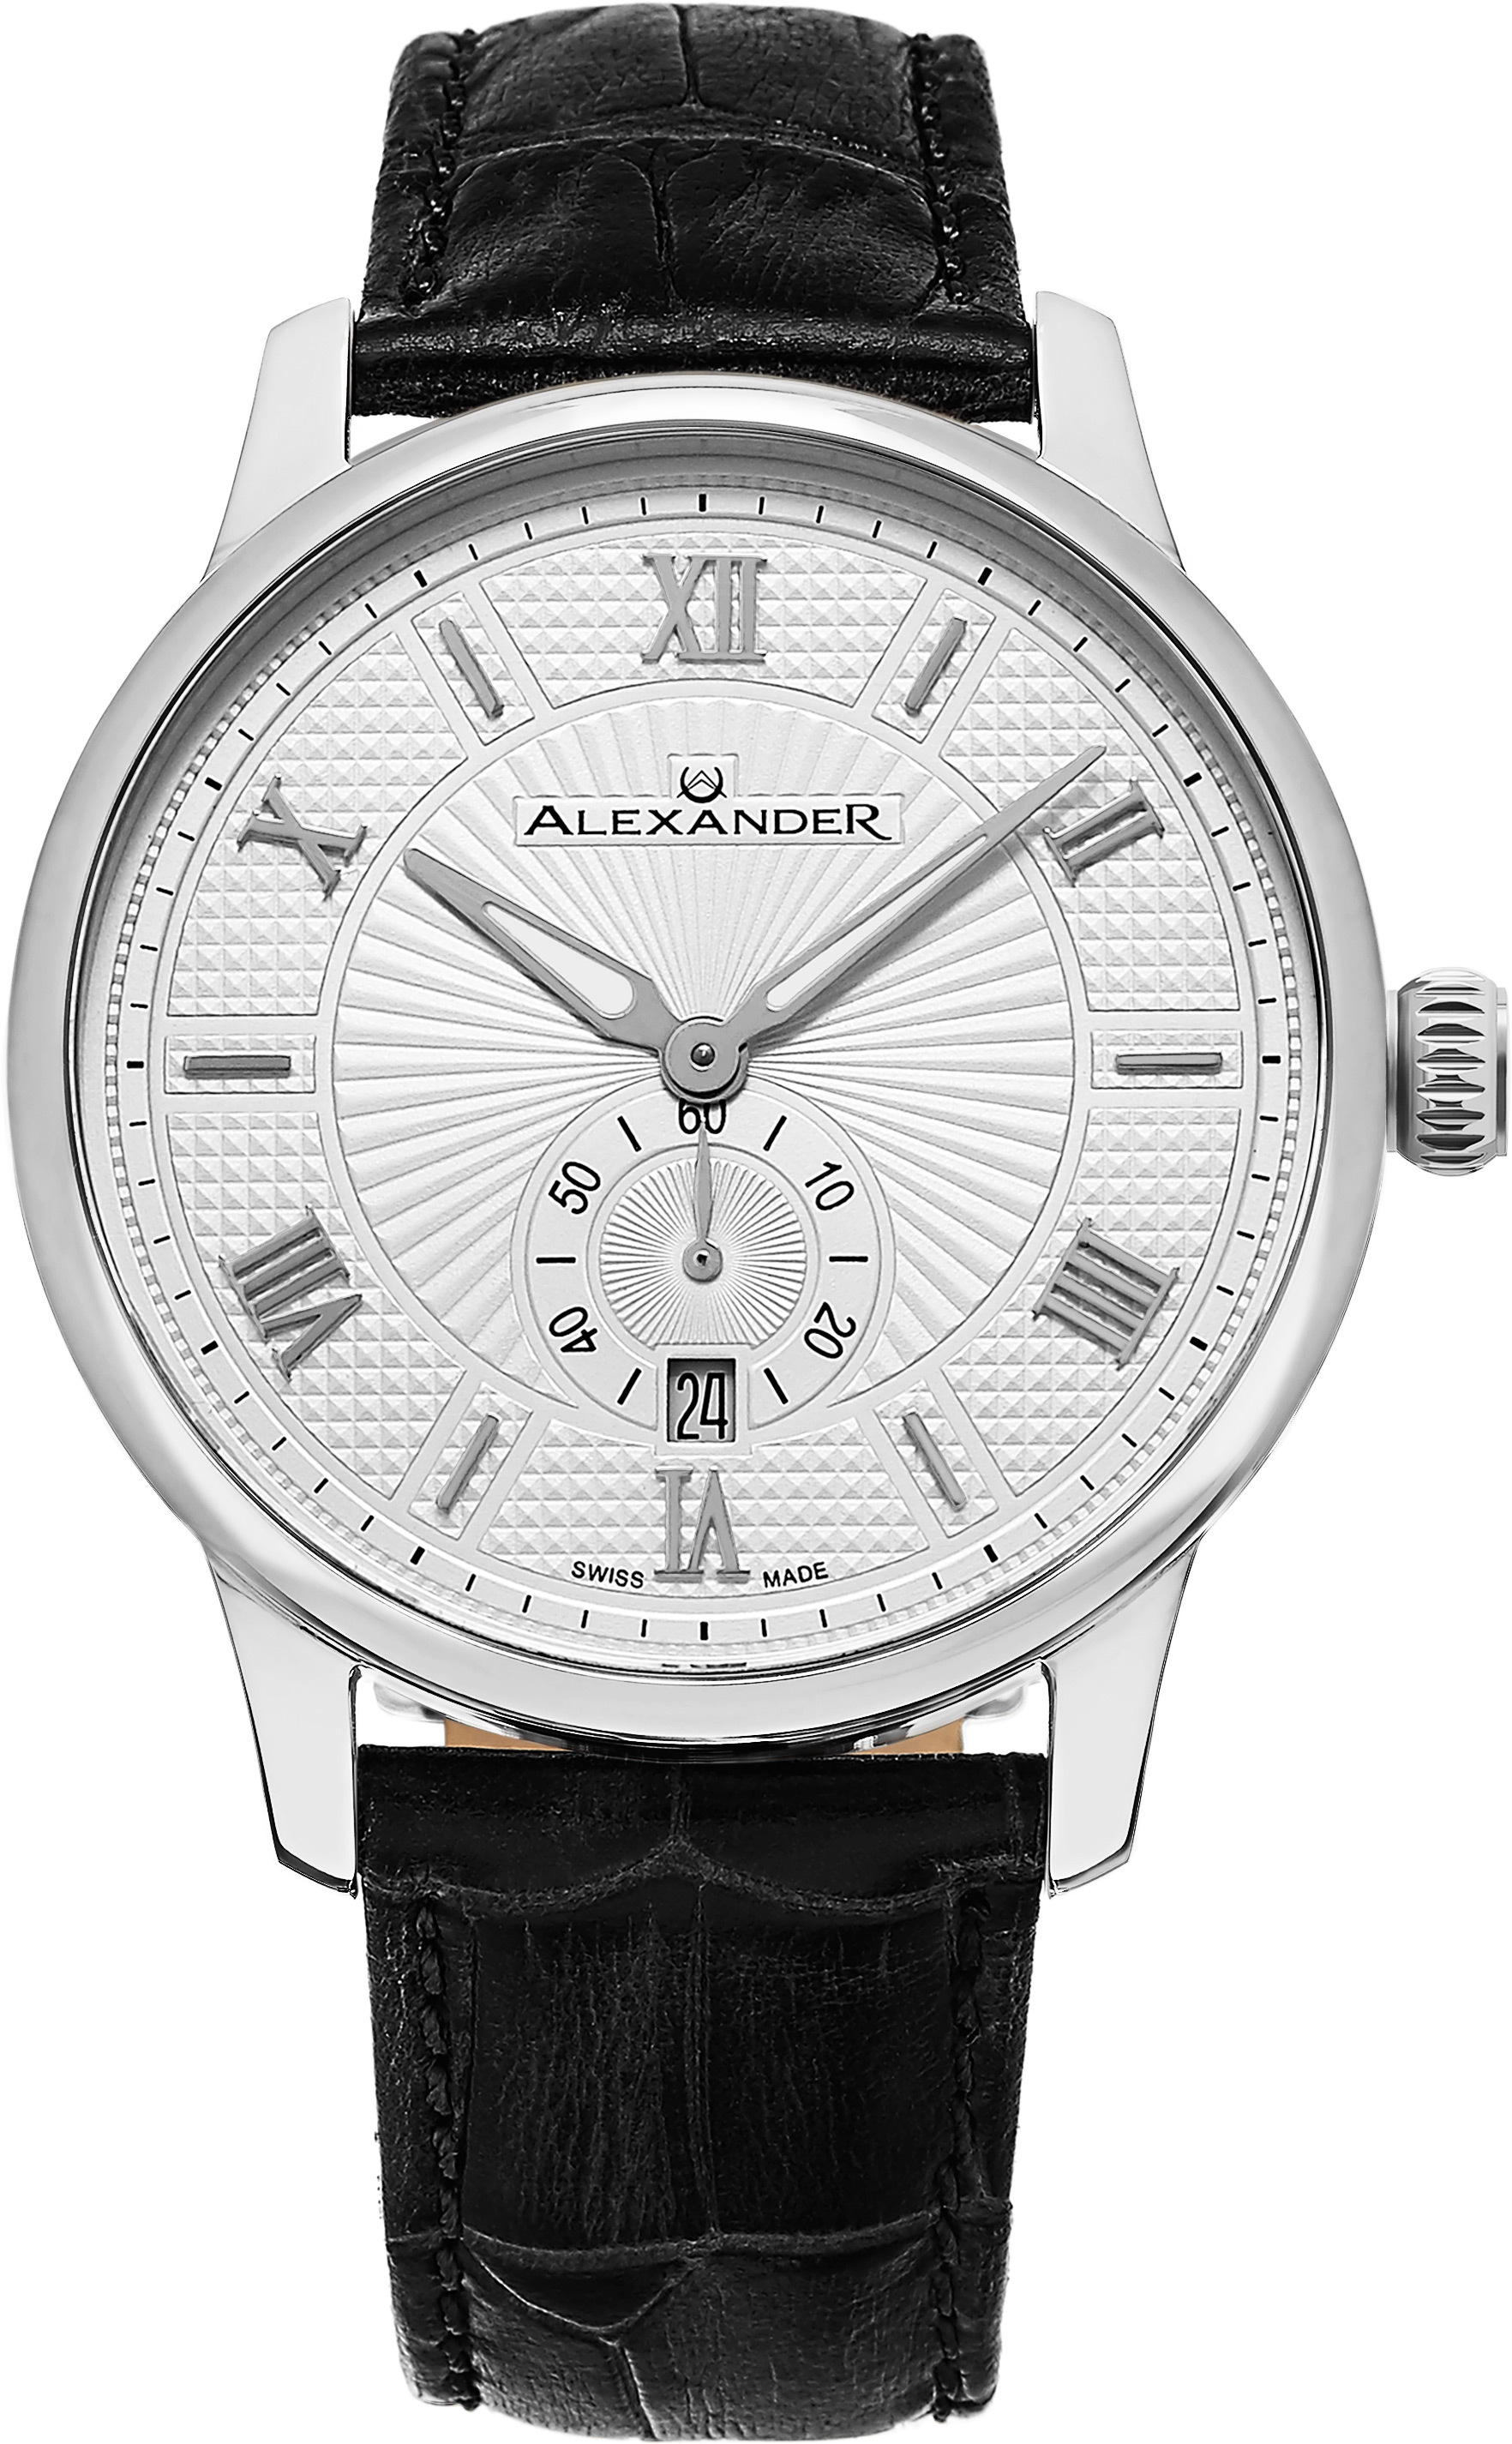 Alexander Statesman Herrklocka A102-01 Silverfärgad/Läder Ø42 mm - Alexander